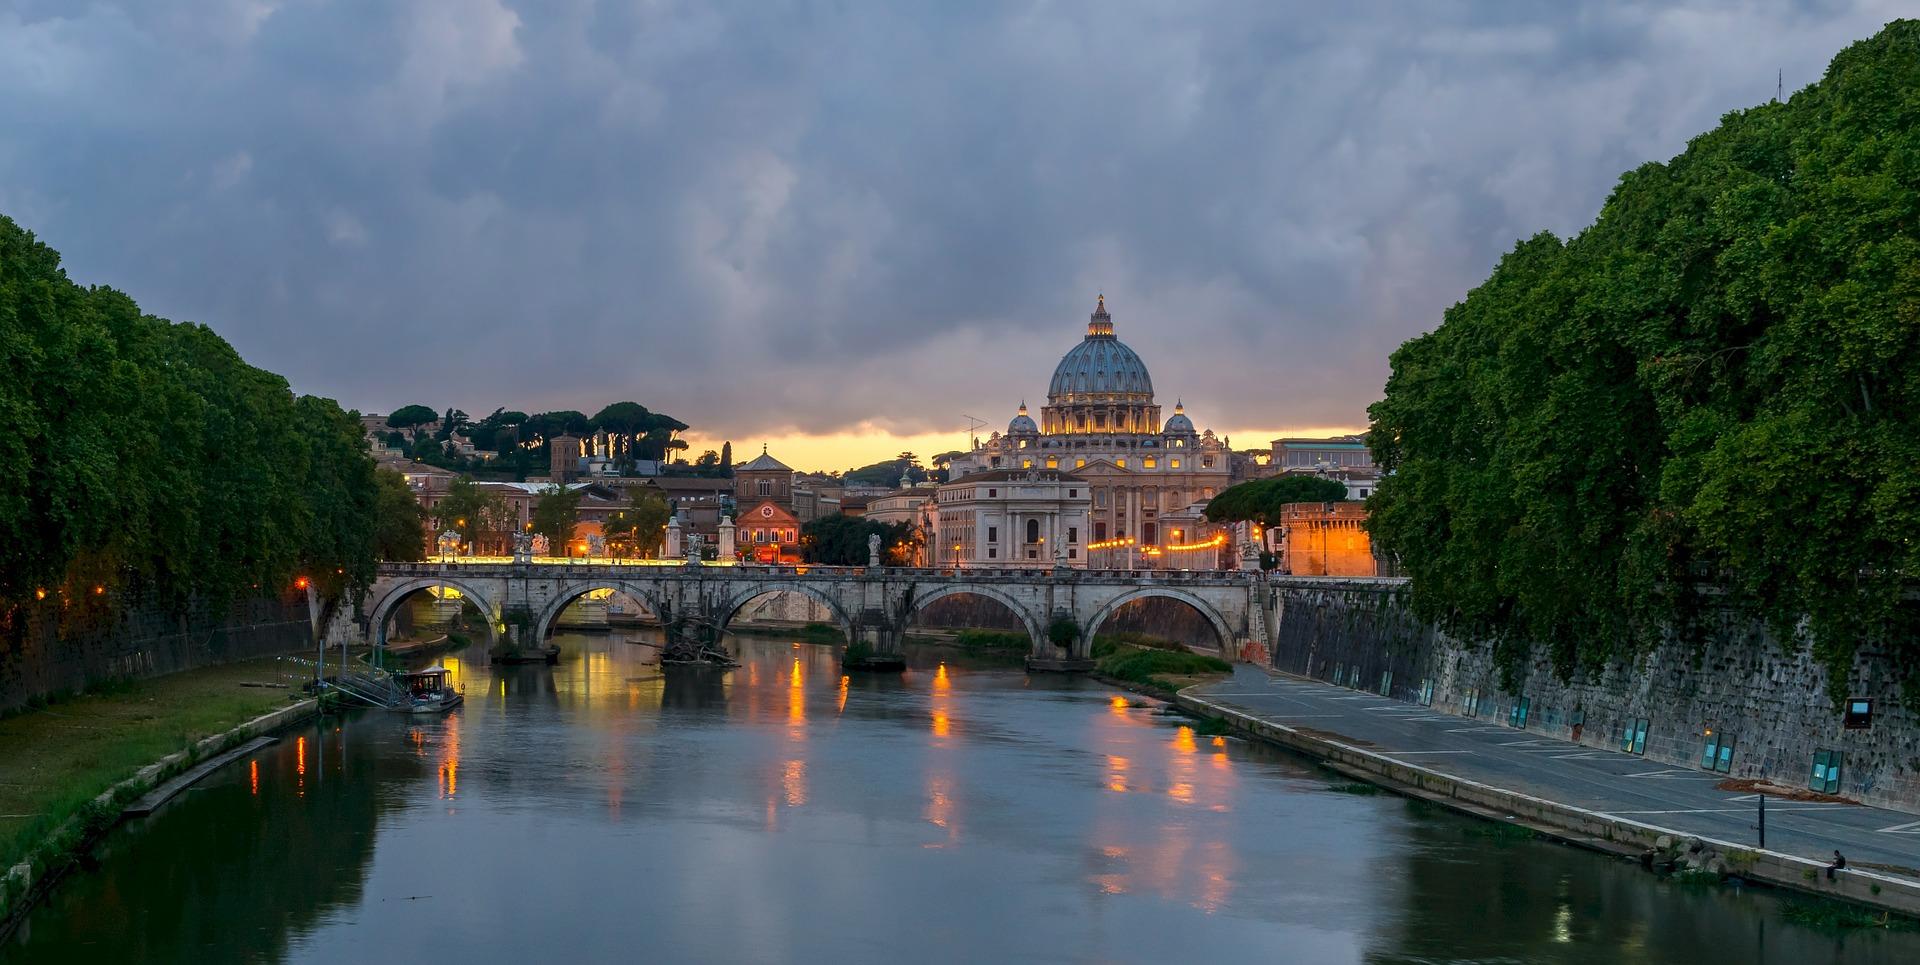 St. Peter's Basilica, Vatican City, Rome